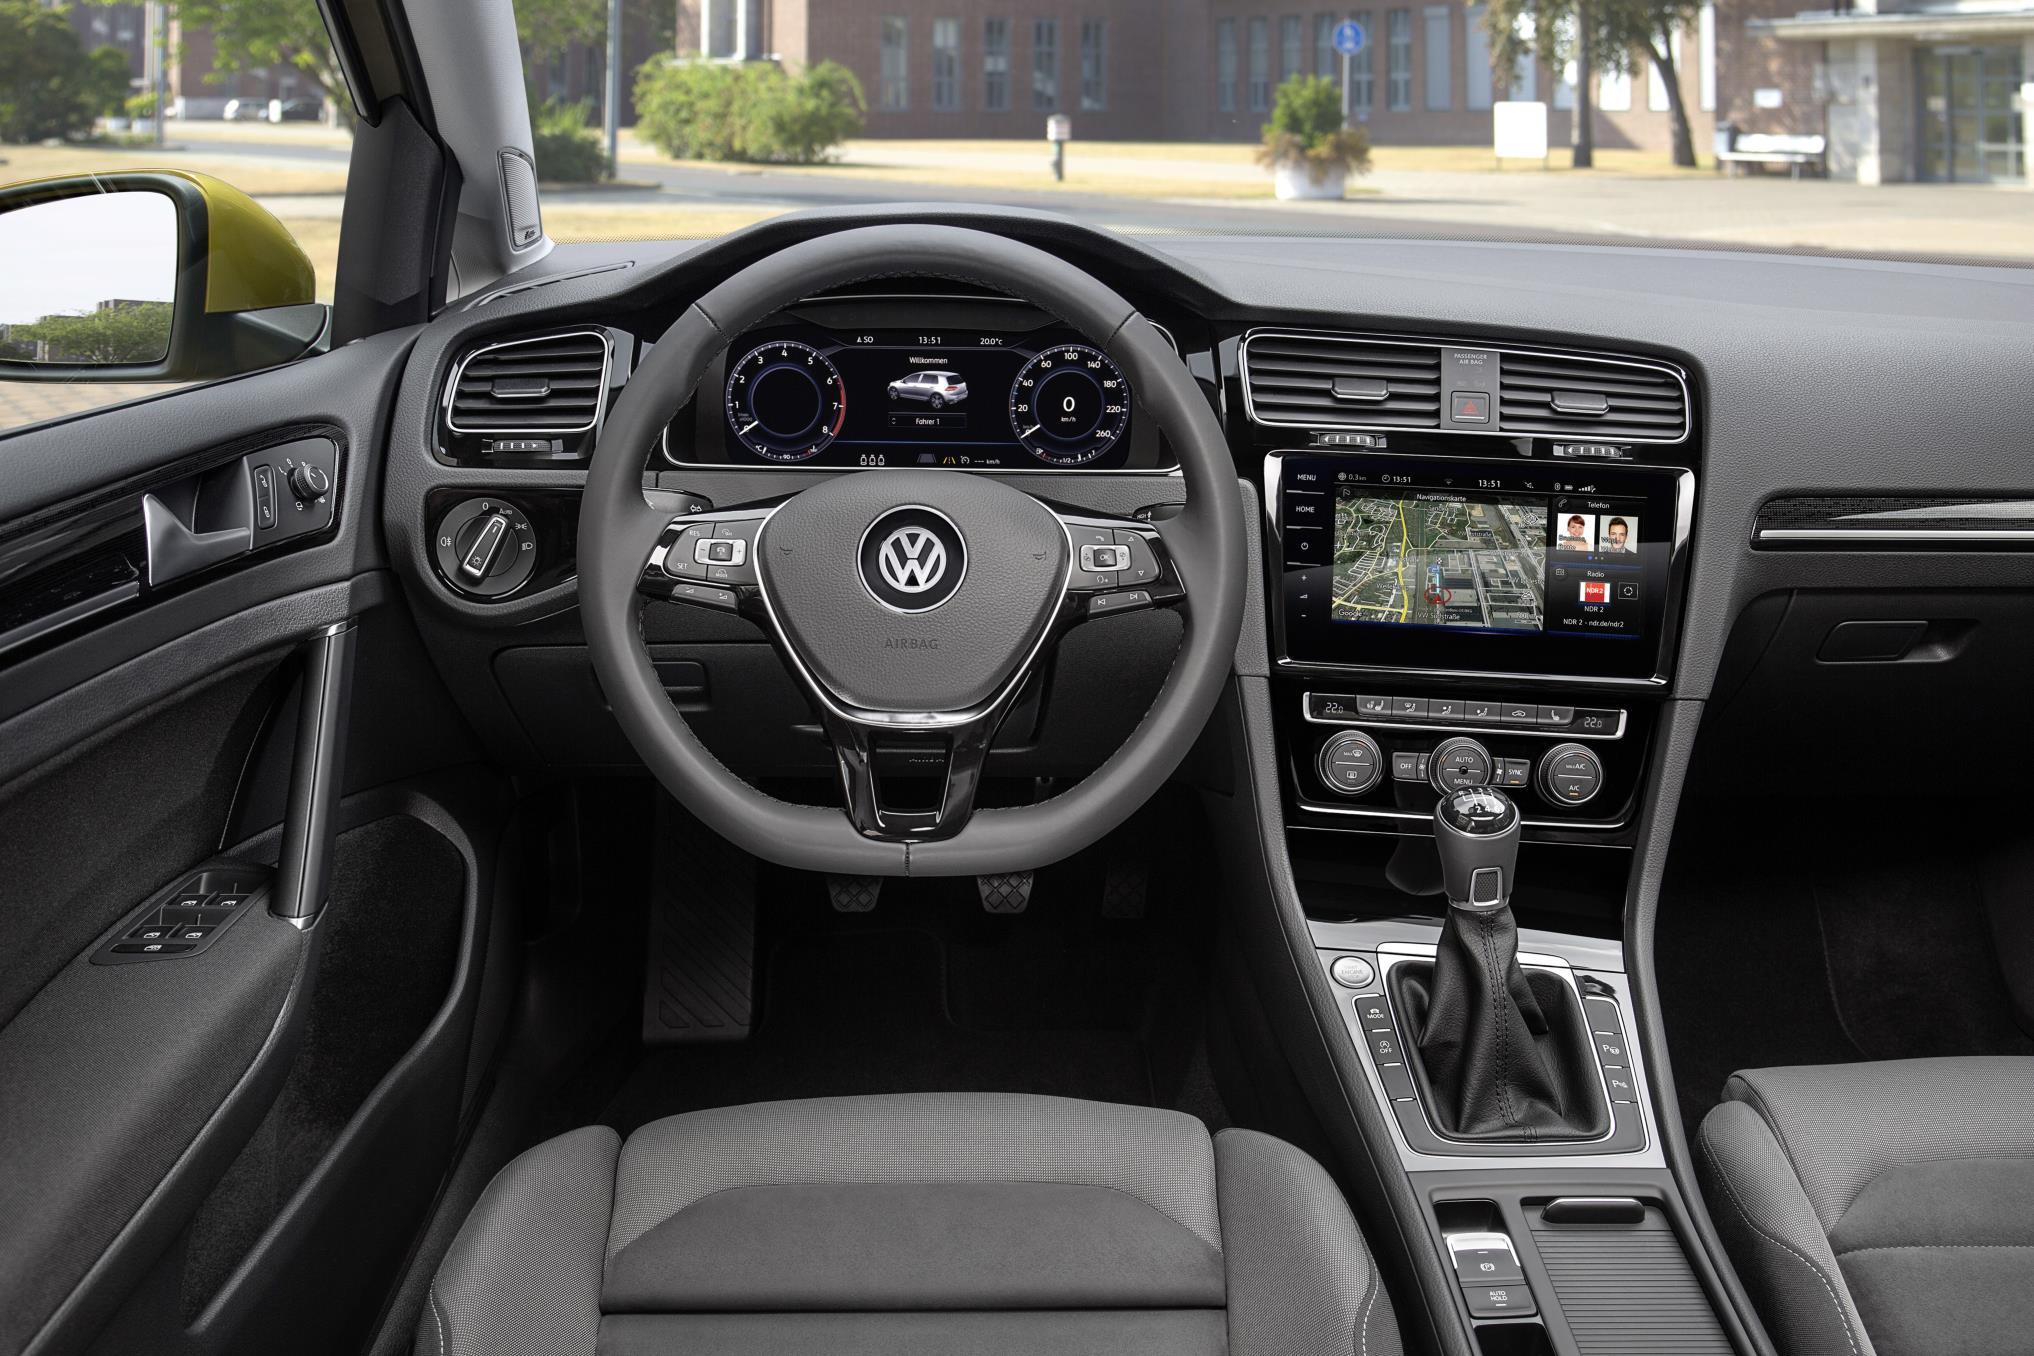 2017 Volkswagen Golf Interior